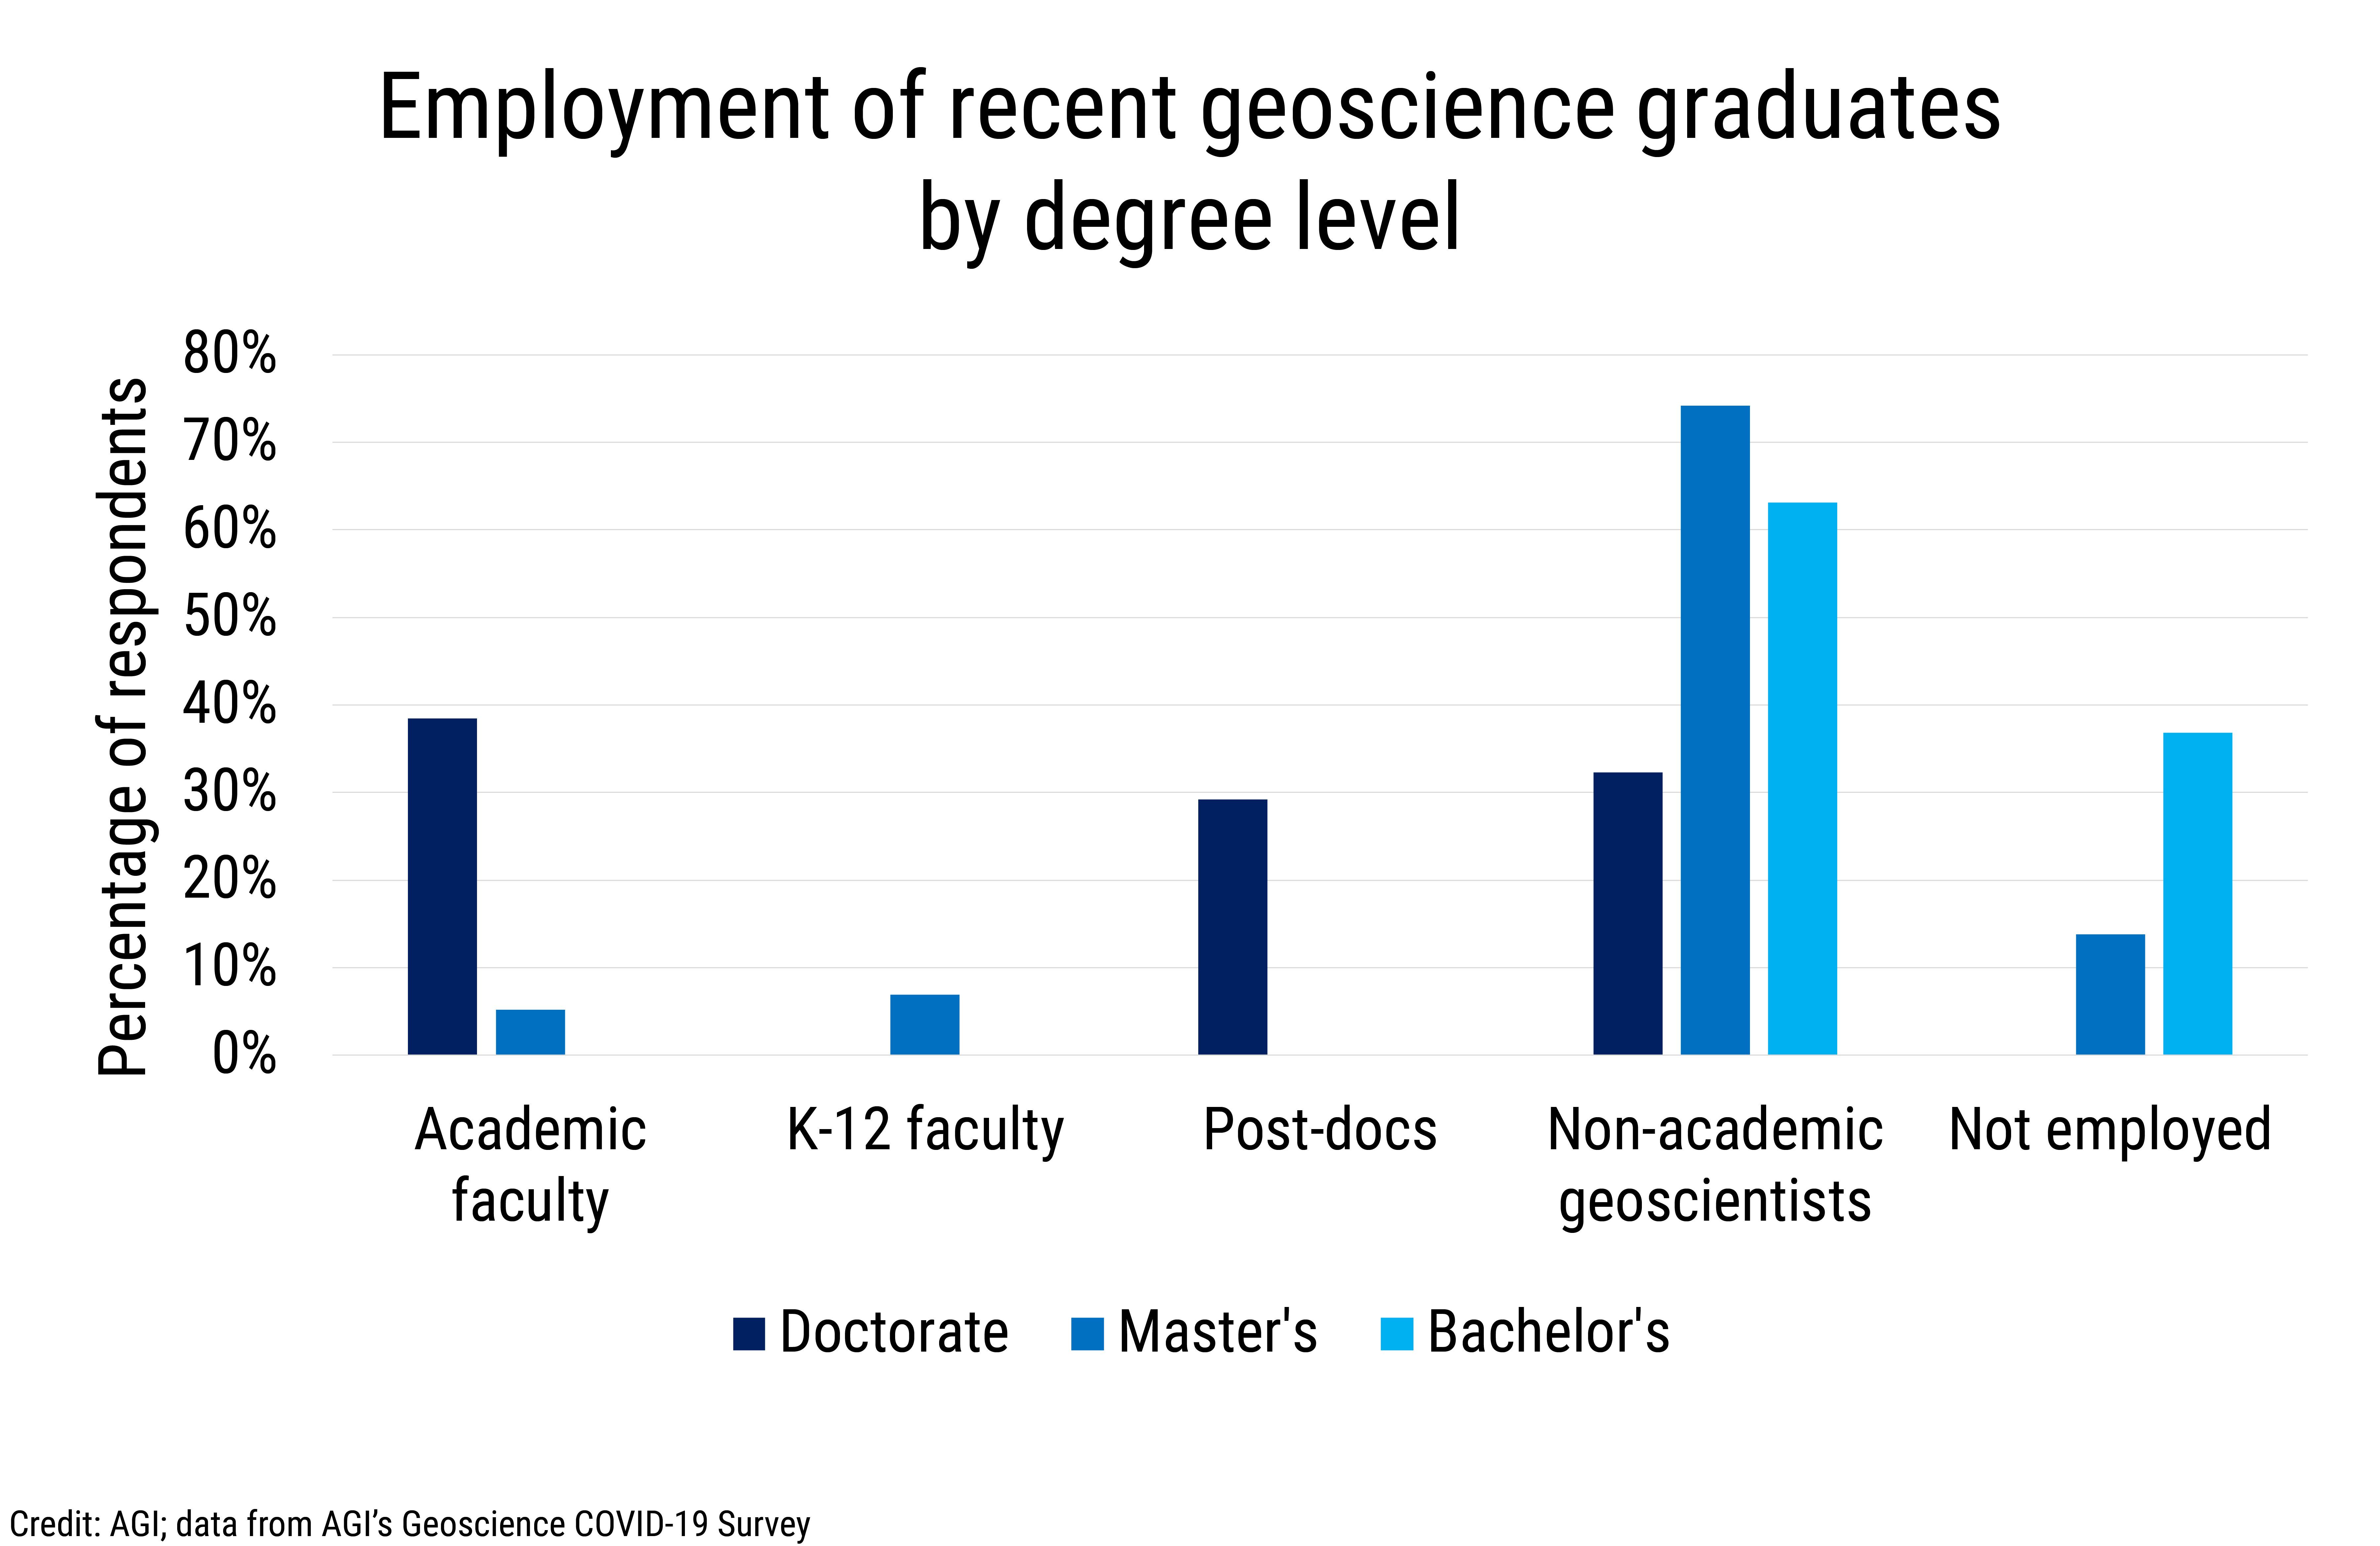 Data Brief 2020-010 chart 02: Employment of recent geoscience graduates by degree level (credit: AGI; data from AGI's Geoscience COVID-19 Survey)